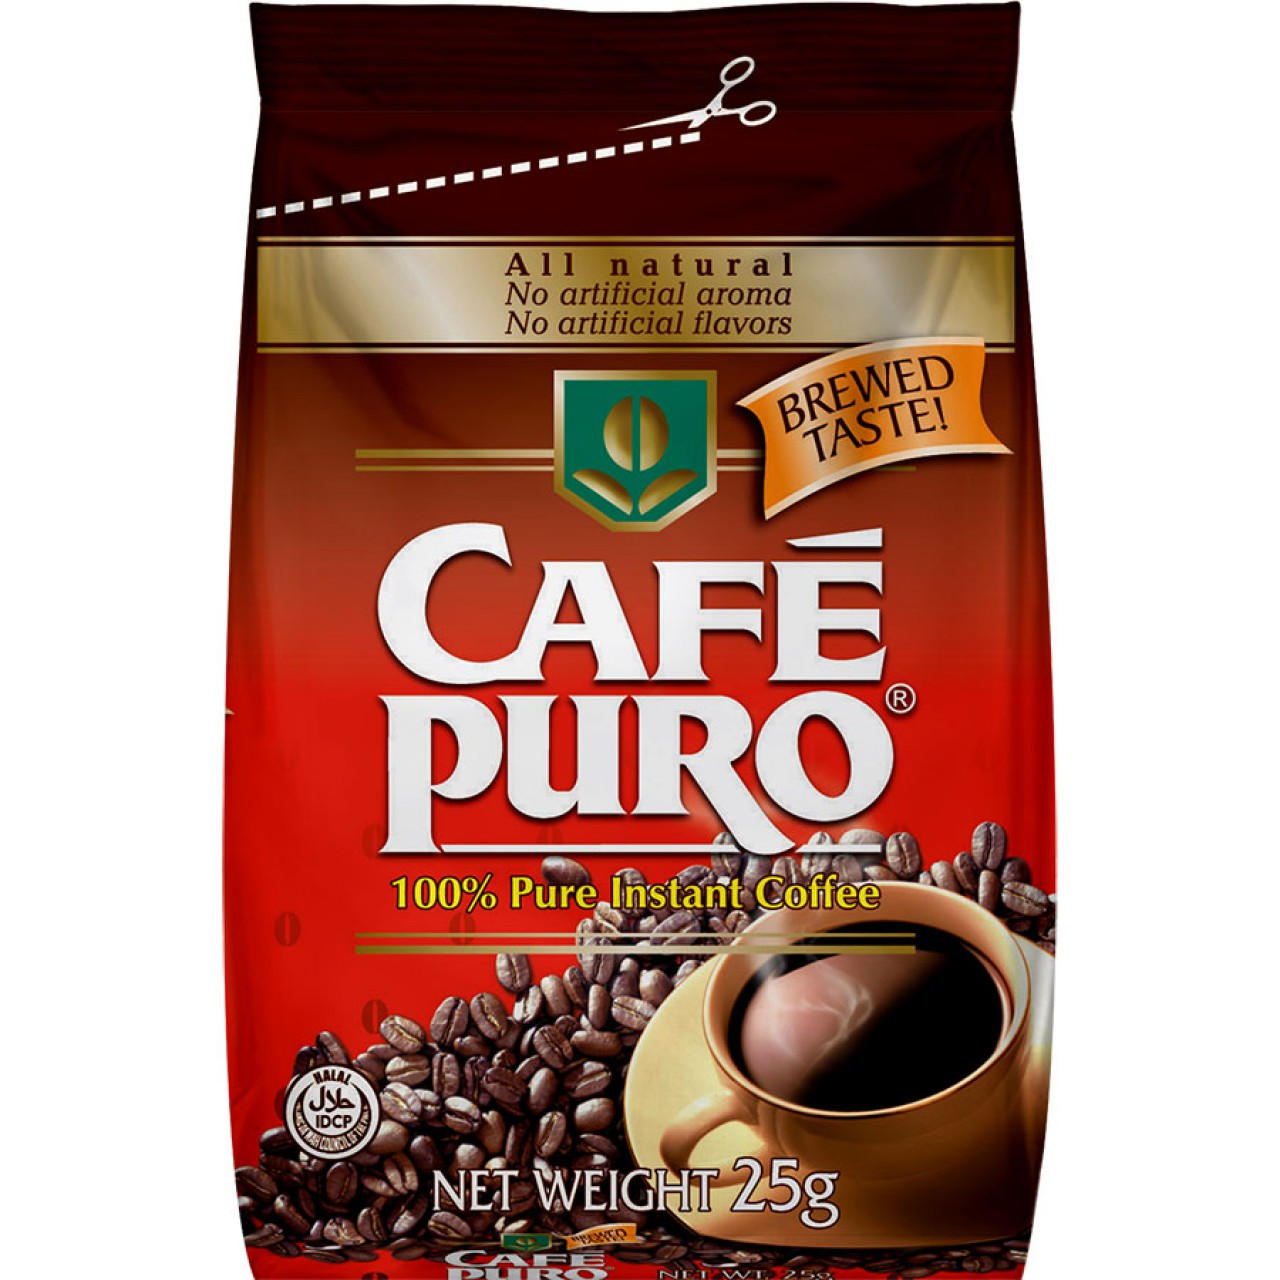 CAFE PURO ECONO PACK 25G